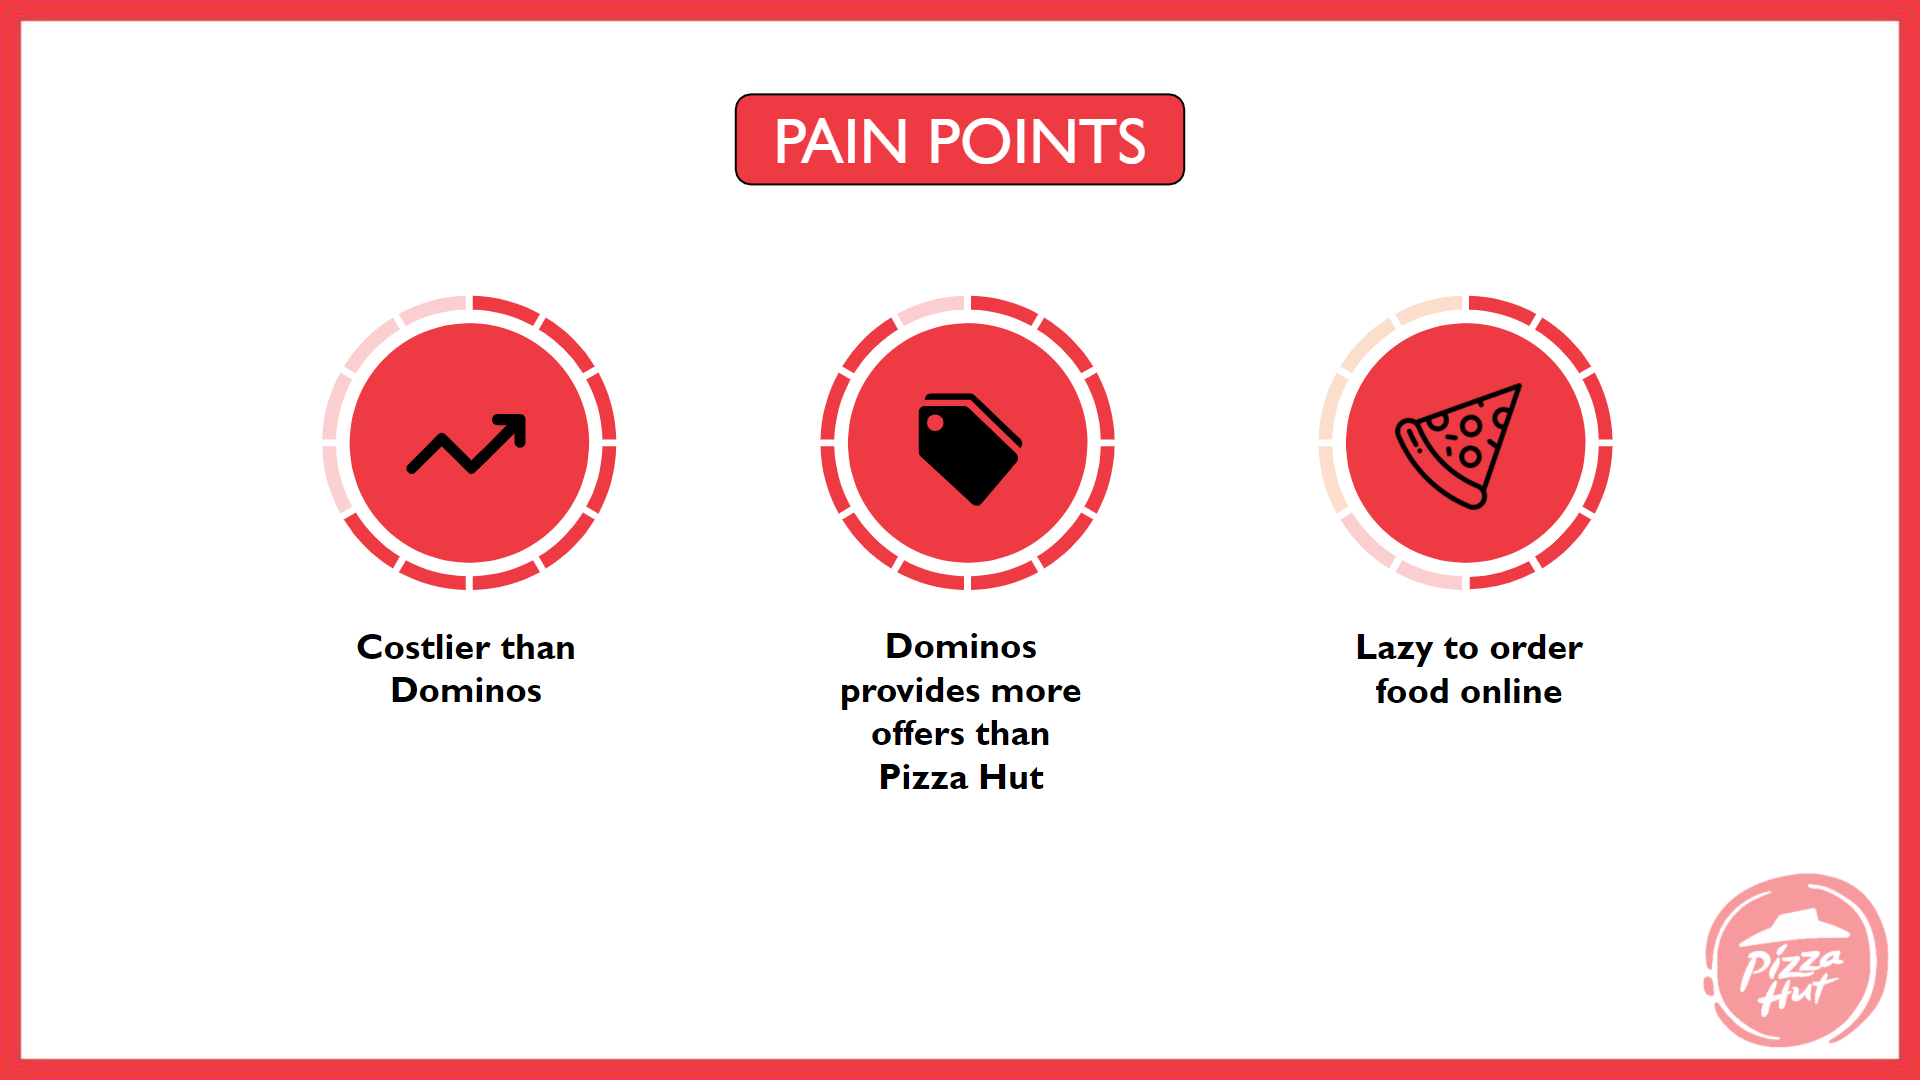 pizza hut marketing strategy Pain Point Analysis - Pizza Hut Marketing and Advertising Strategy